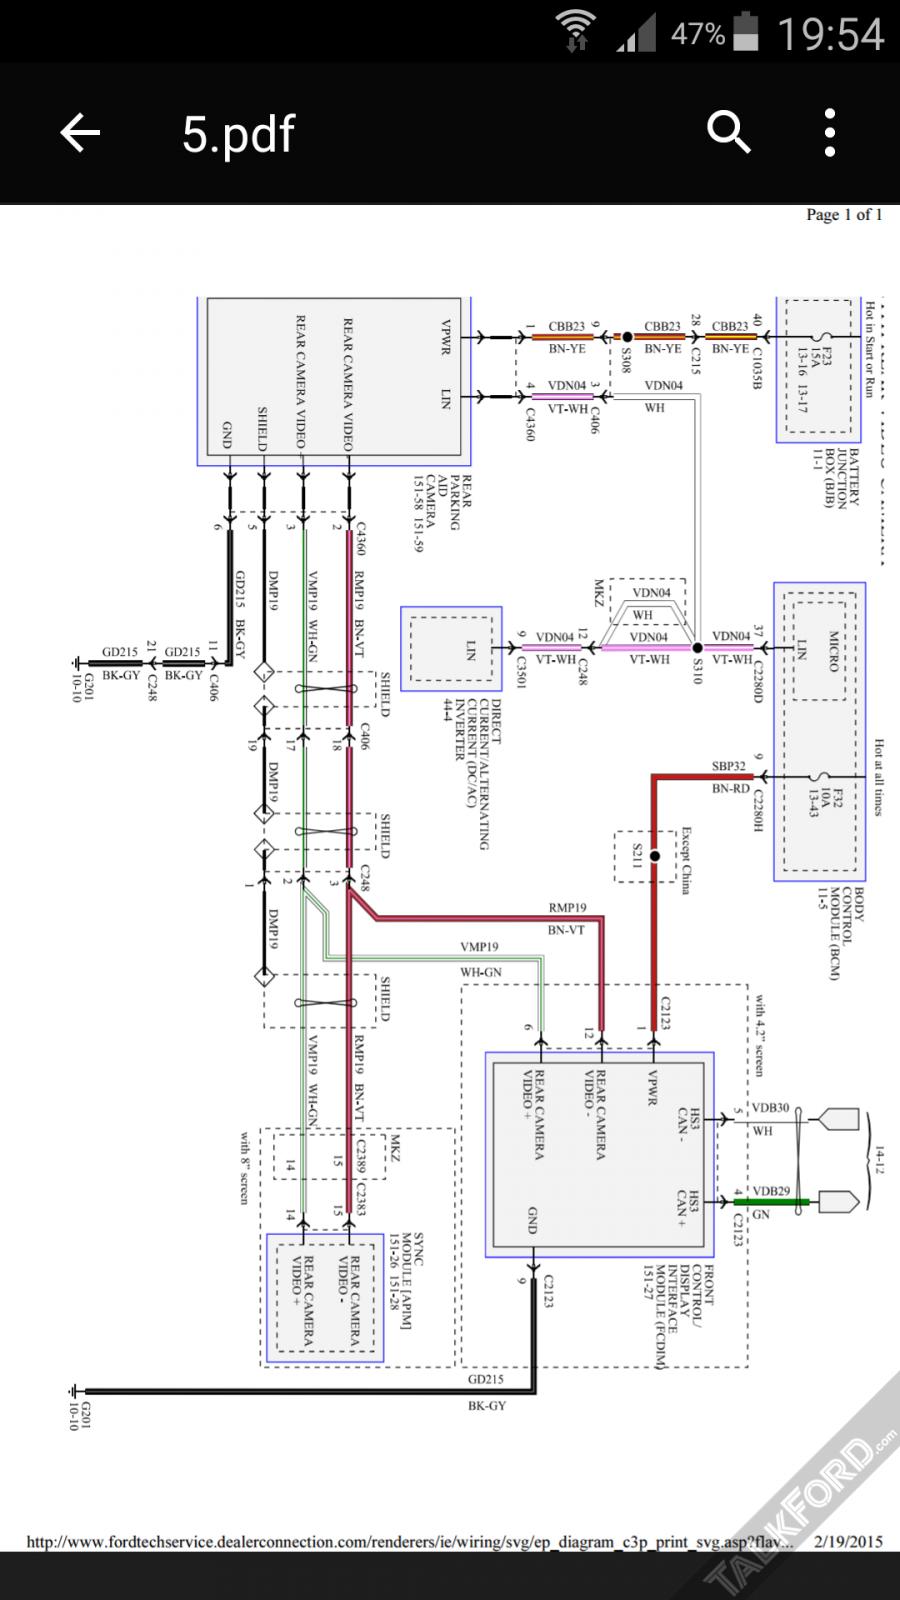 f250 rear view camera wiring diagram lk 1326  camera wiring diagram ford transit wiring diagram  camera wiring diagram ford transit